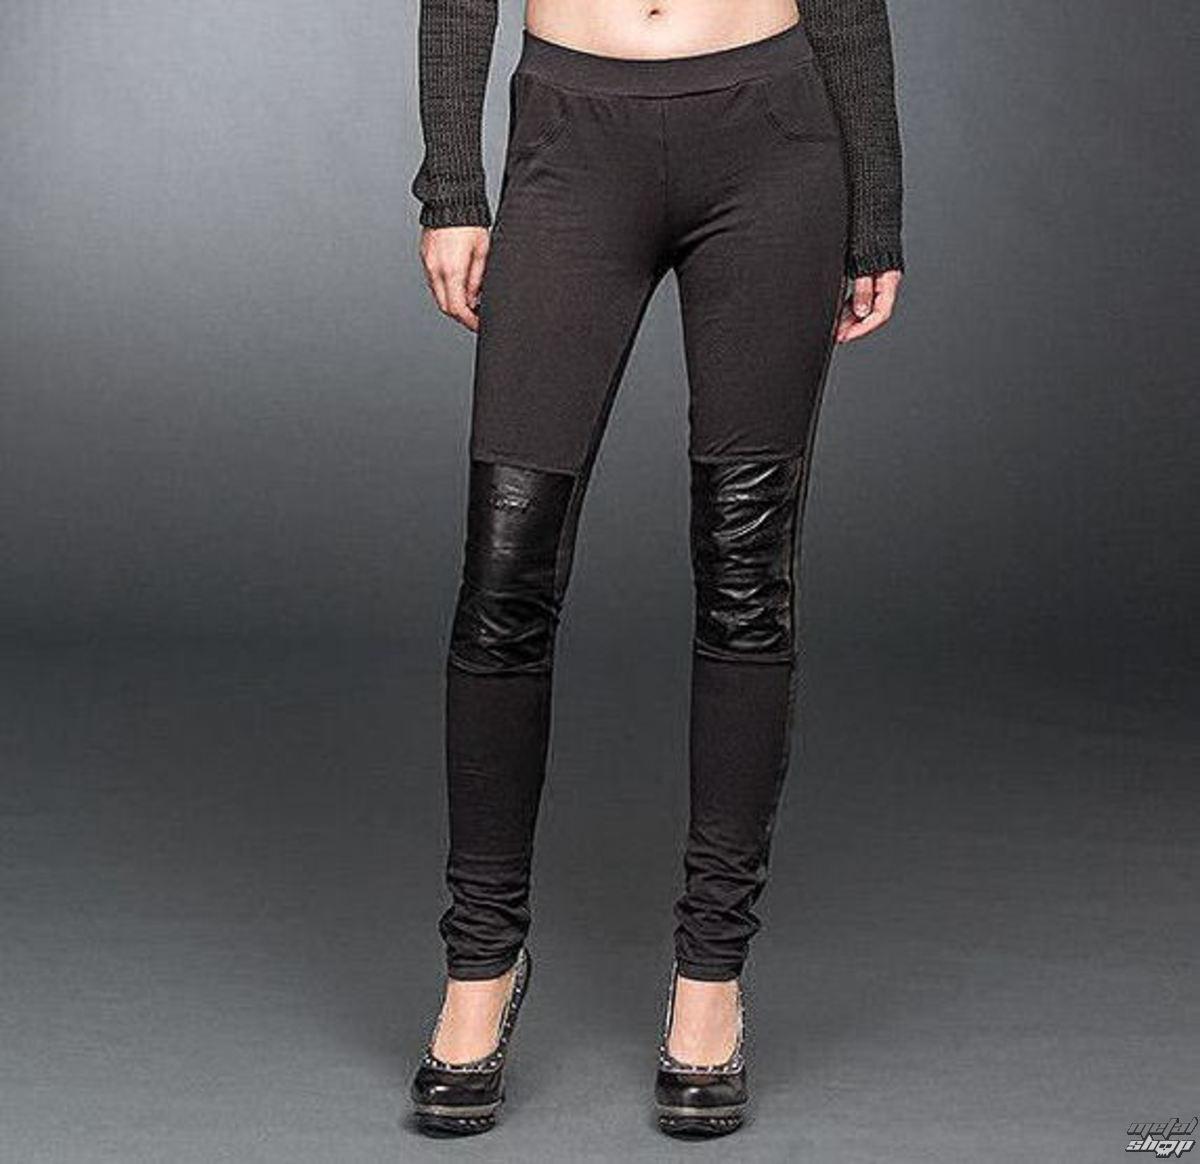 kalhoty dámské (leginy) QUEEN OF DARKNESS - Black - TR1-274/15